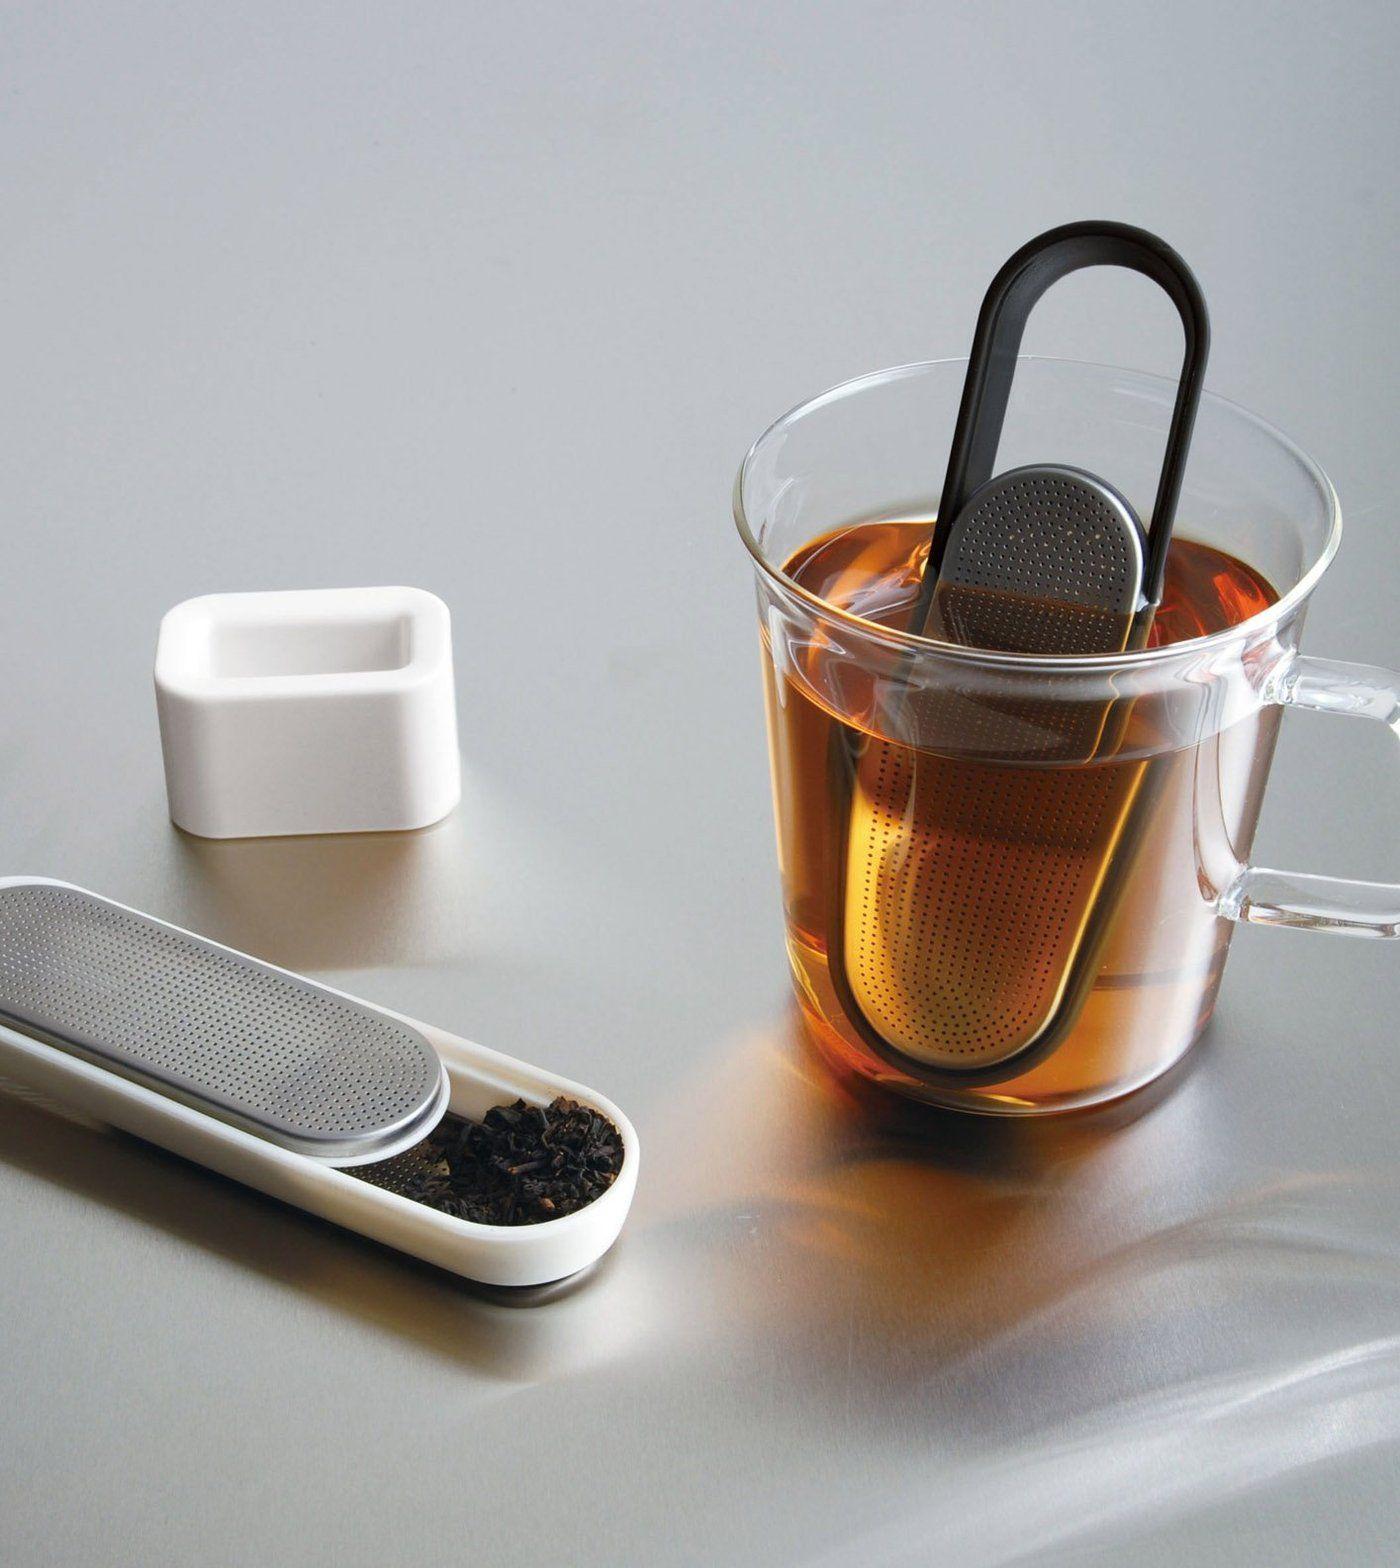 Loop Tea Strainer (With images) Tea strainer, Rustic diy